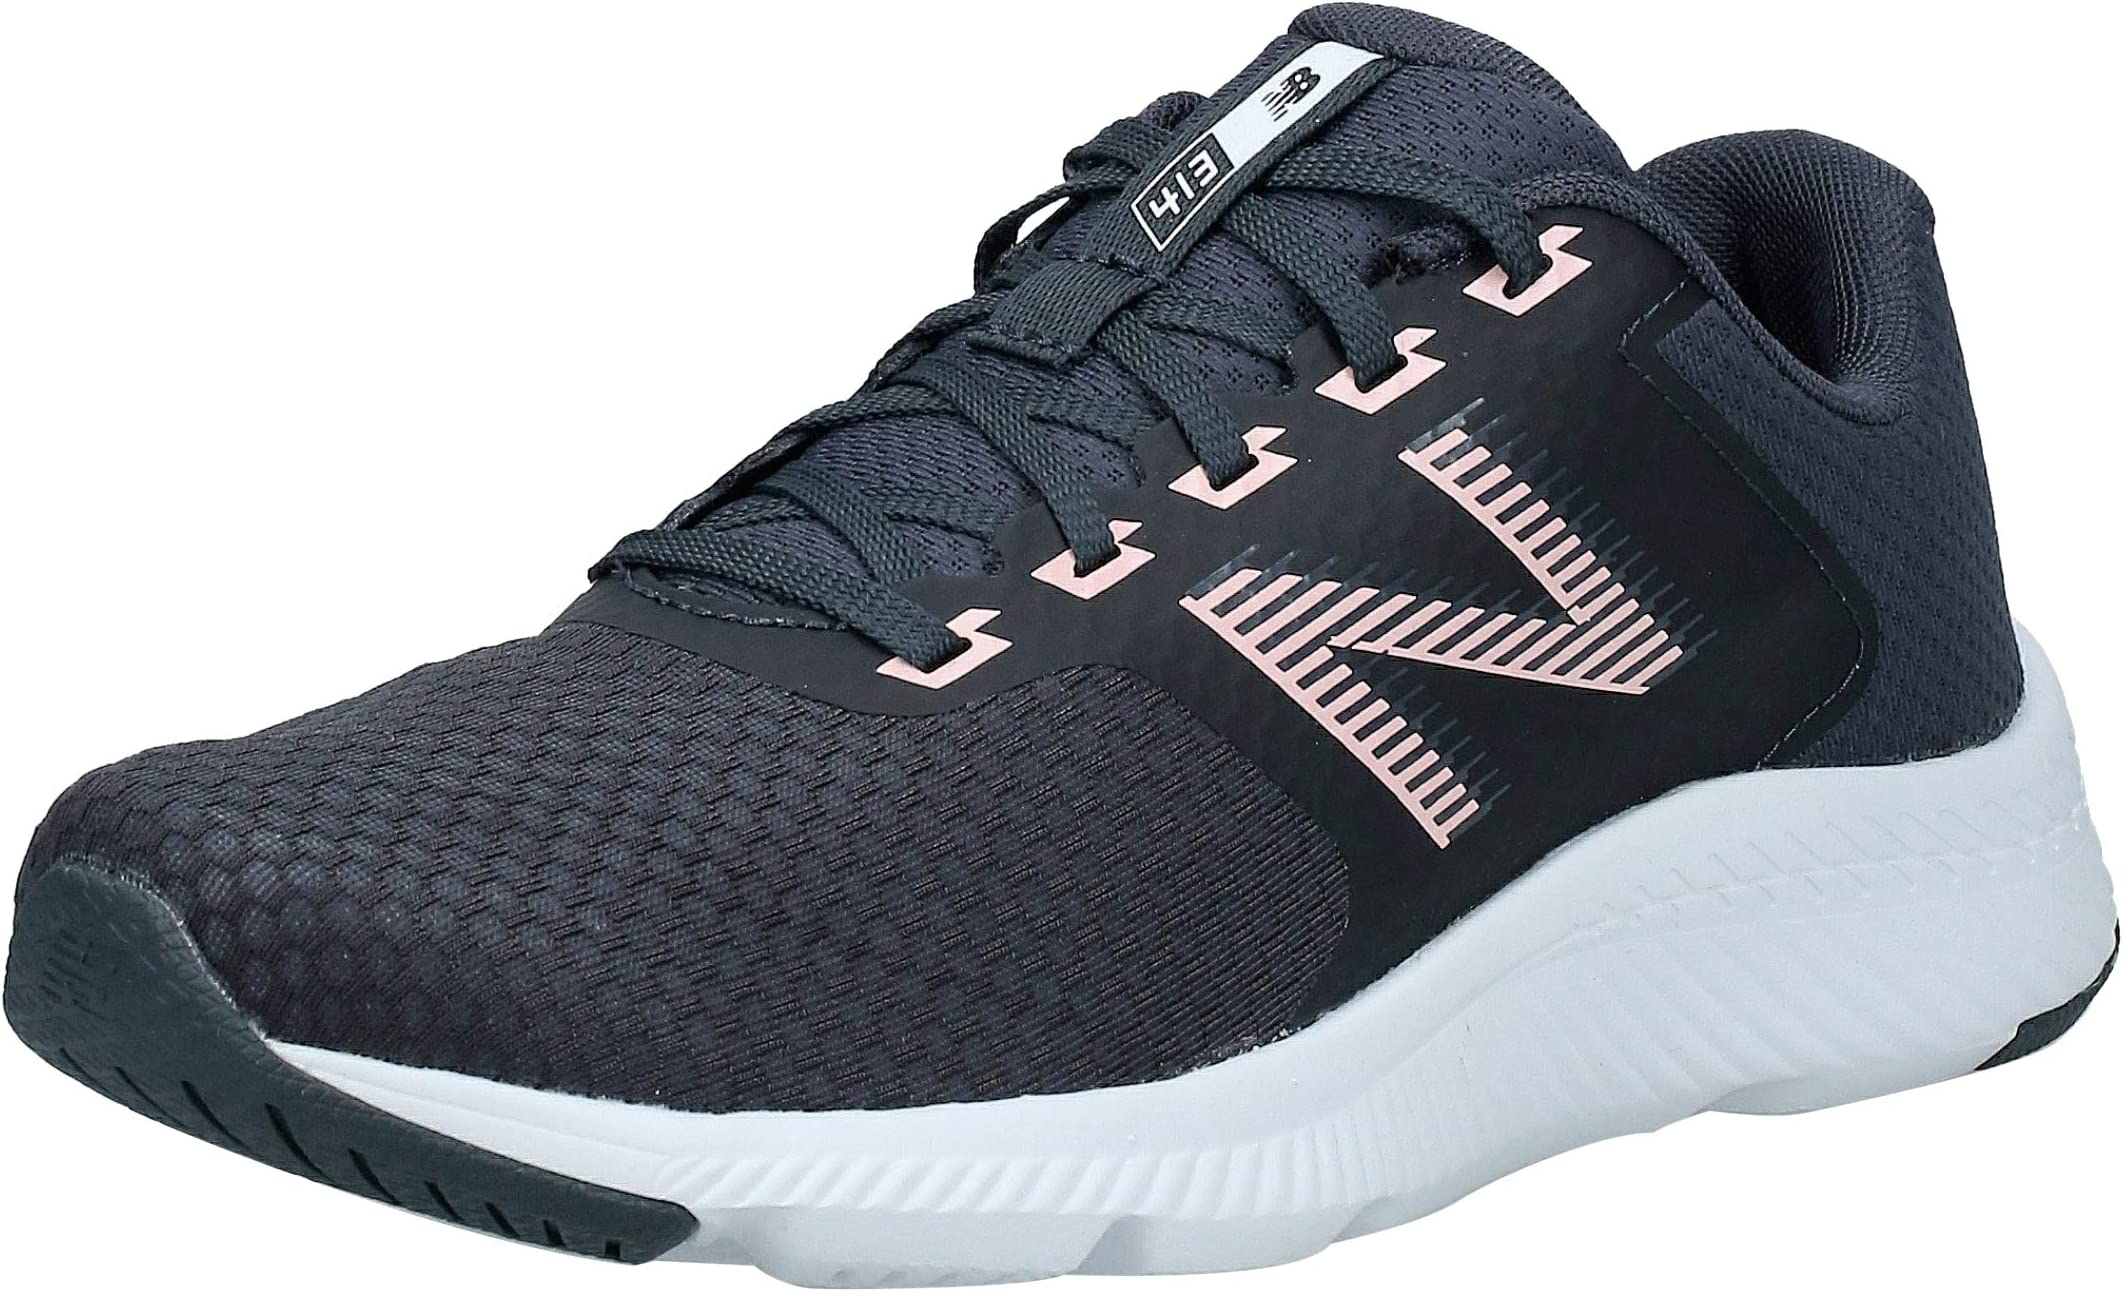 New Balance 413, Women's Fitness & Cross Training Shoes price in UAE    Amazon UAE   kanbkam